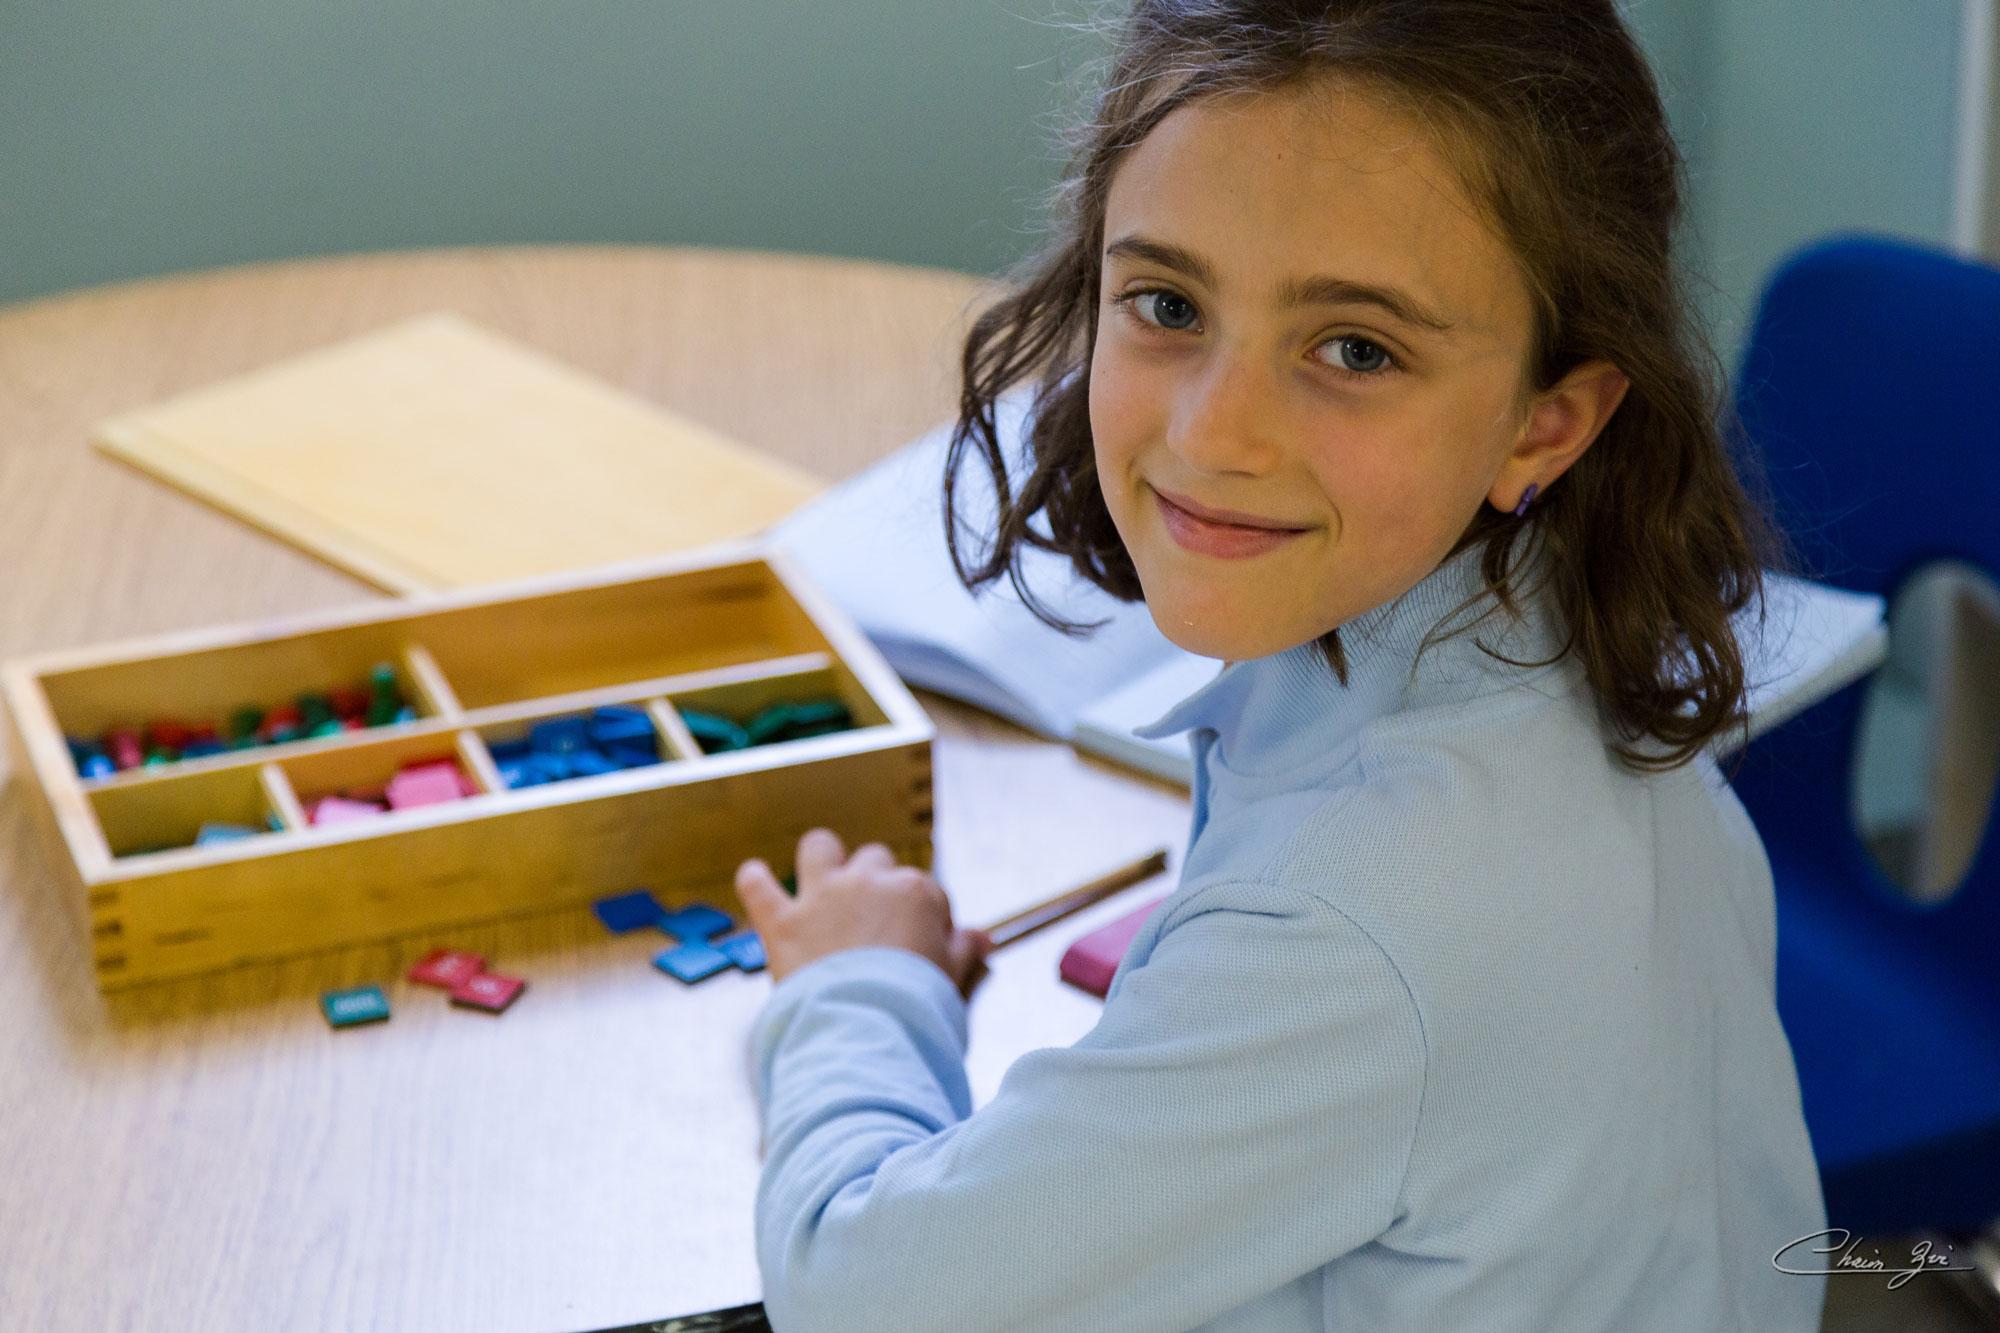 grass-creative-identity-montessori-school-NYC-NJ-netivot-school-art-direction-6.jpg